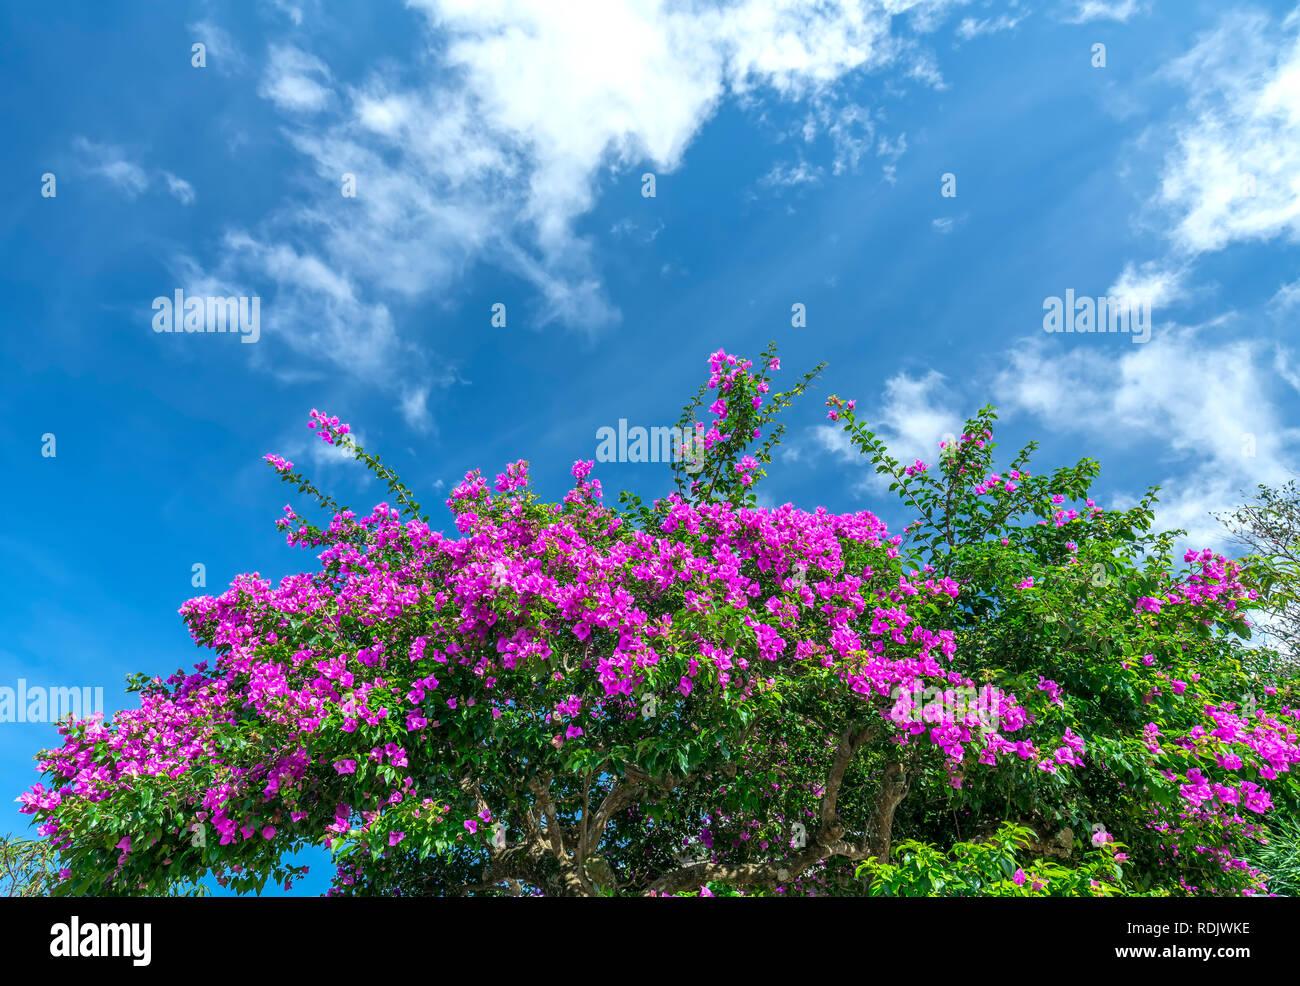 Bougainvillea tree colorful purple blooms under the bright morning sun. Stock Photo